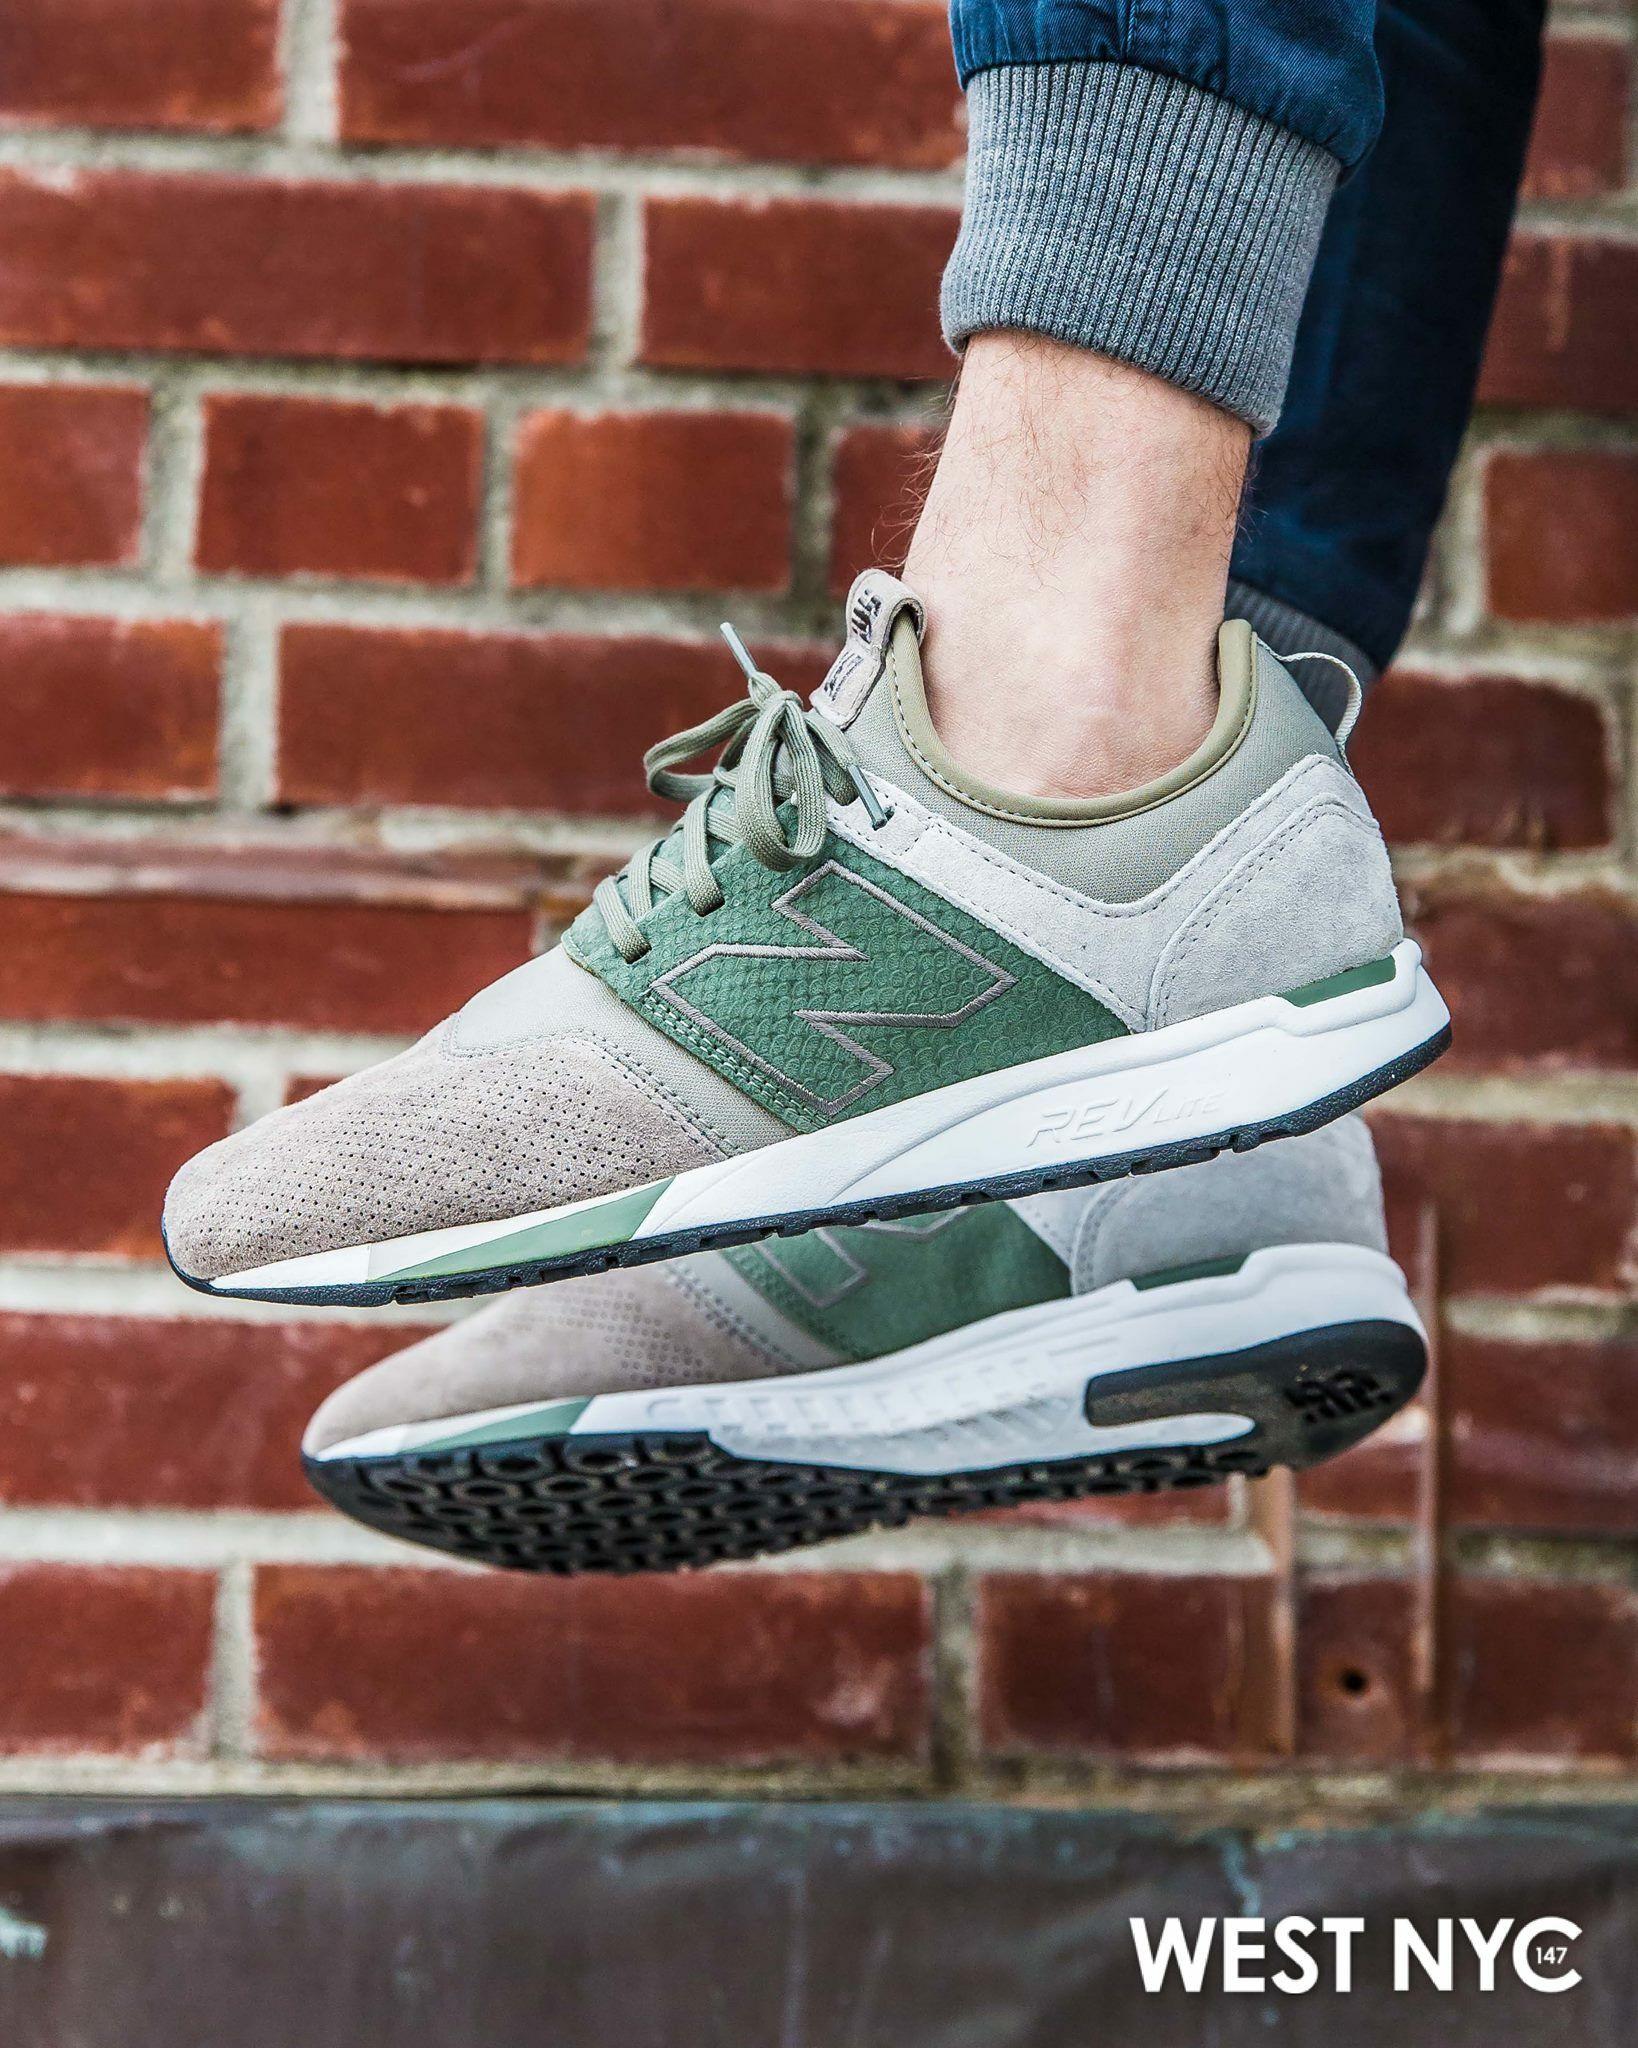 New Balance 247 | Dress shoes men, Sneakers, Best sneakers